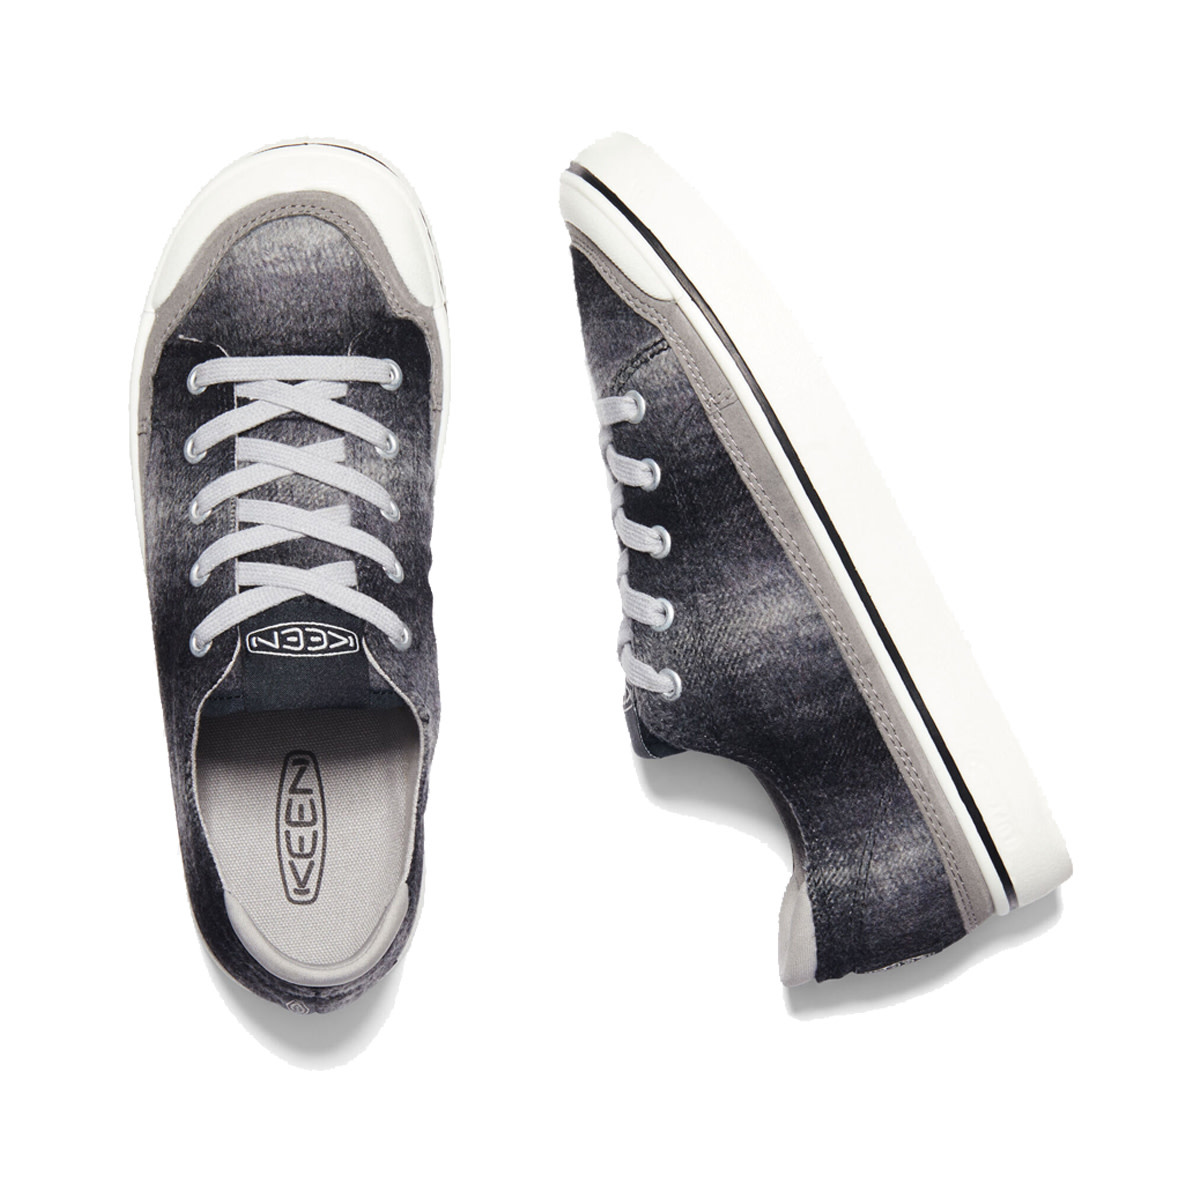 Keen Keen Elsa IV Sneaker Black Plaid